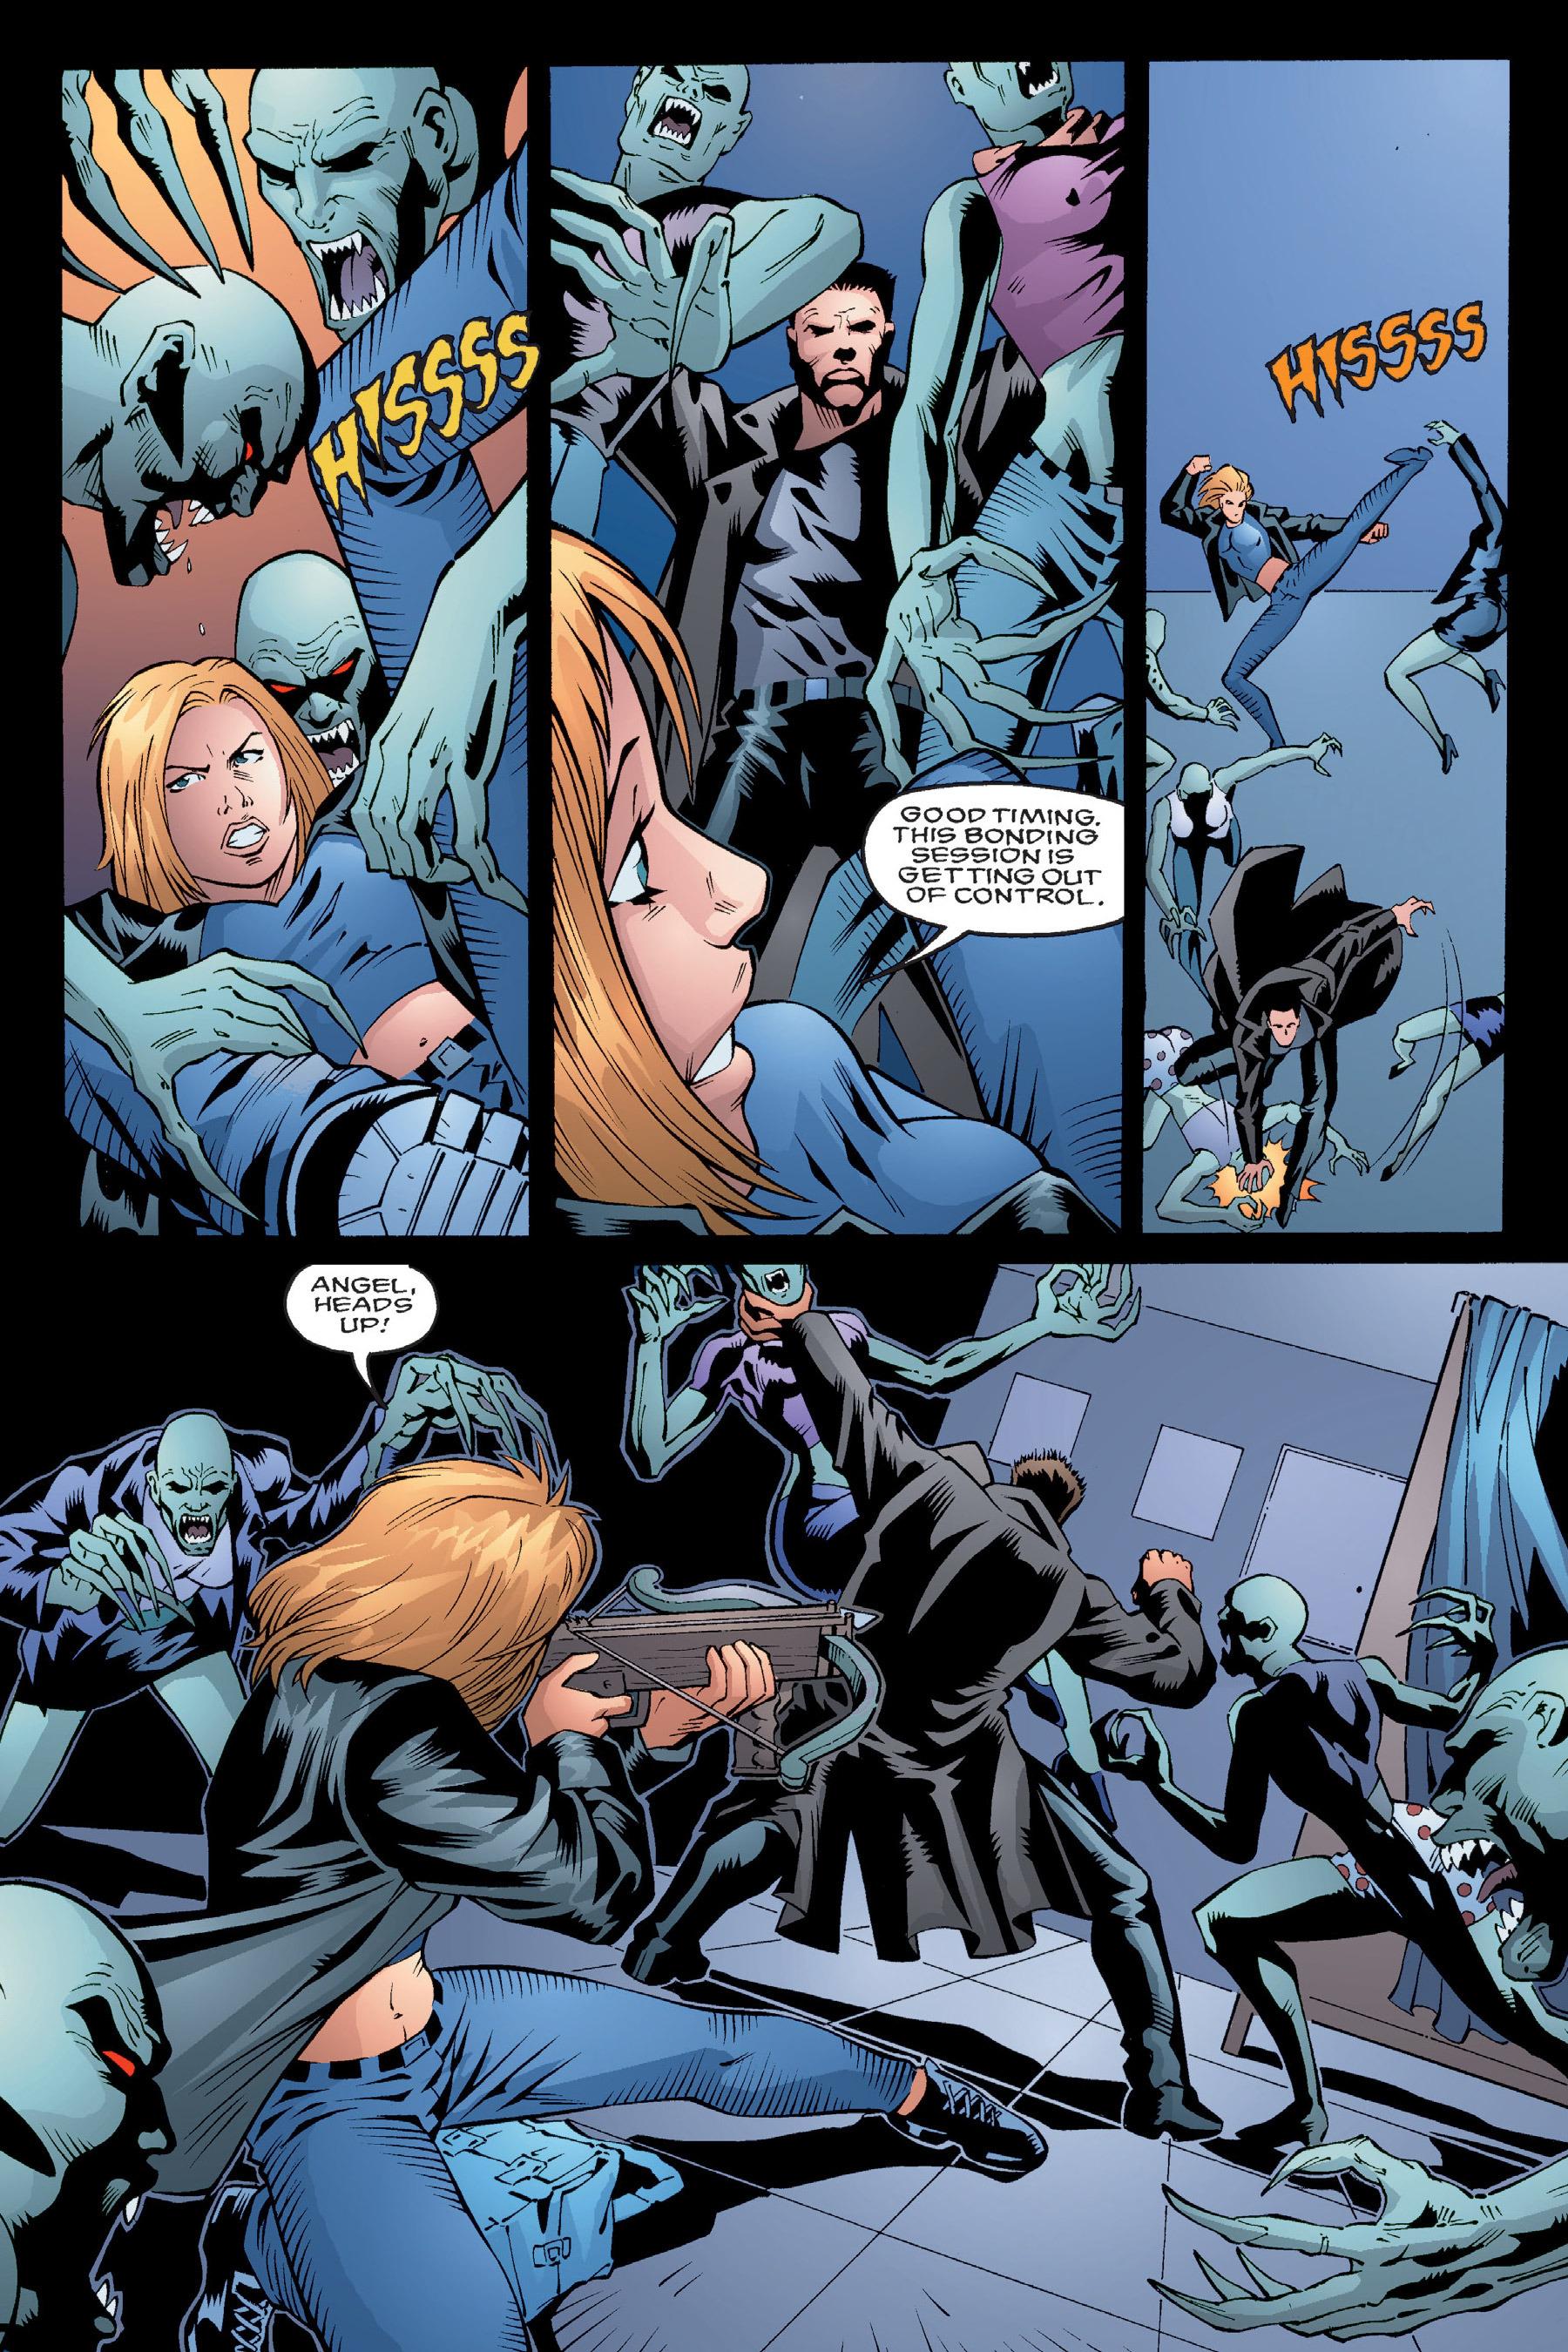 Read online Buffy the Vampire Slayer: Omnibus comic -  Issue # TPB 4 - 50